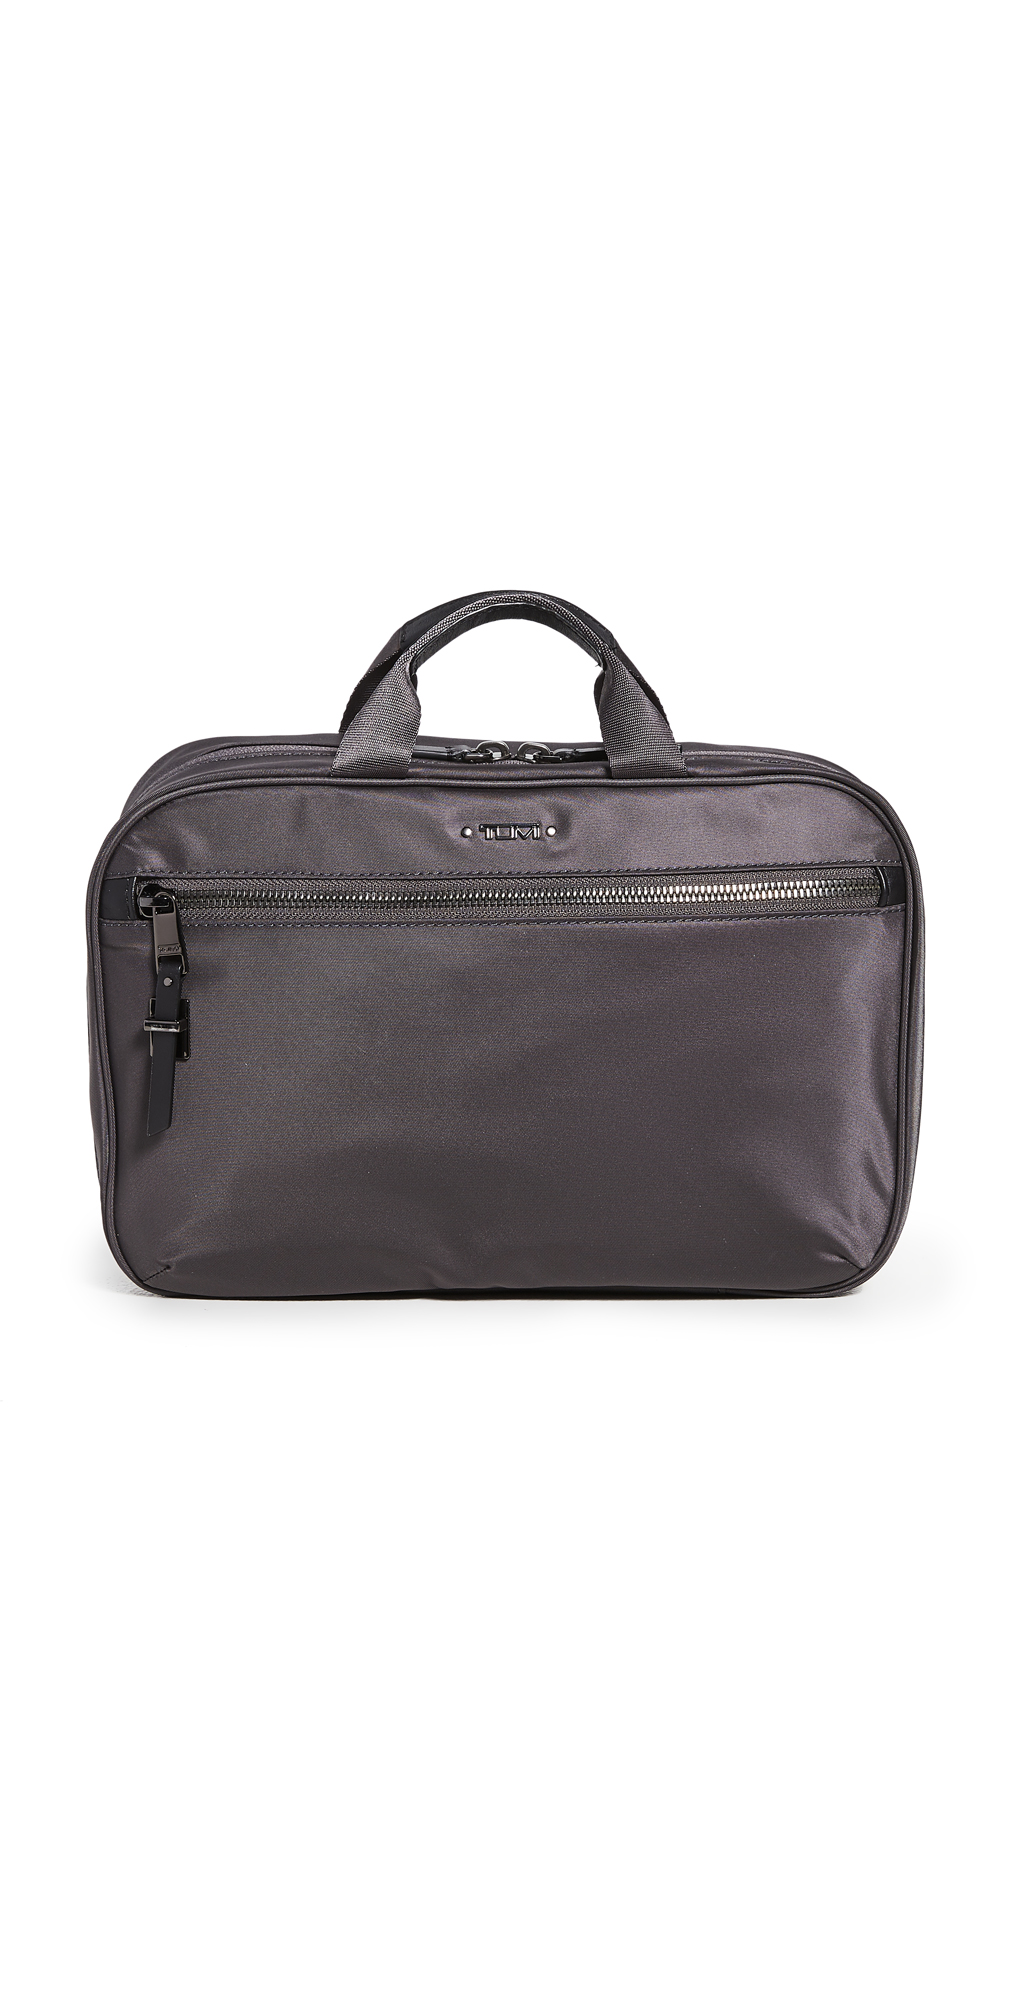 Tumi Madina Cosmetic Bag